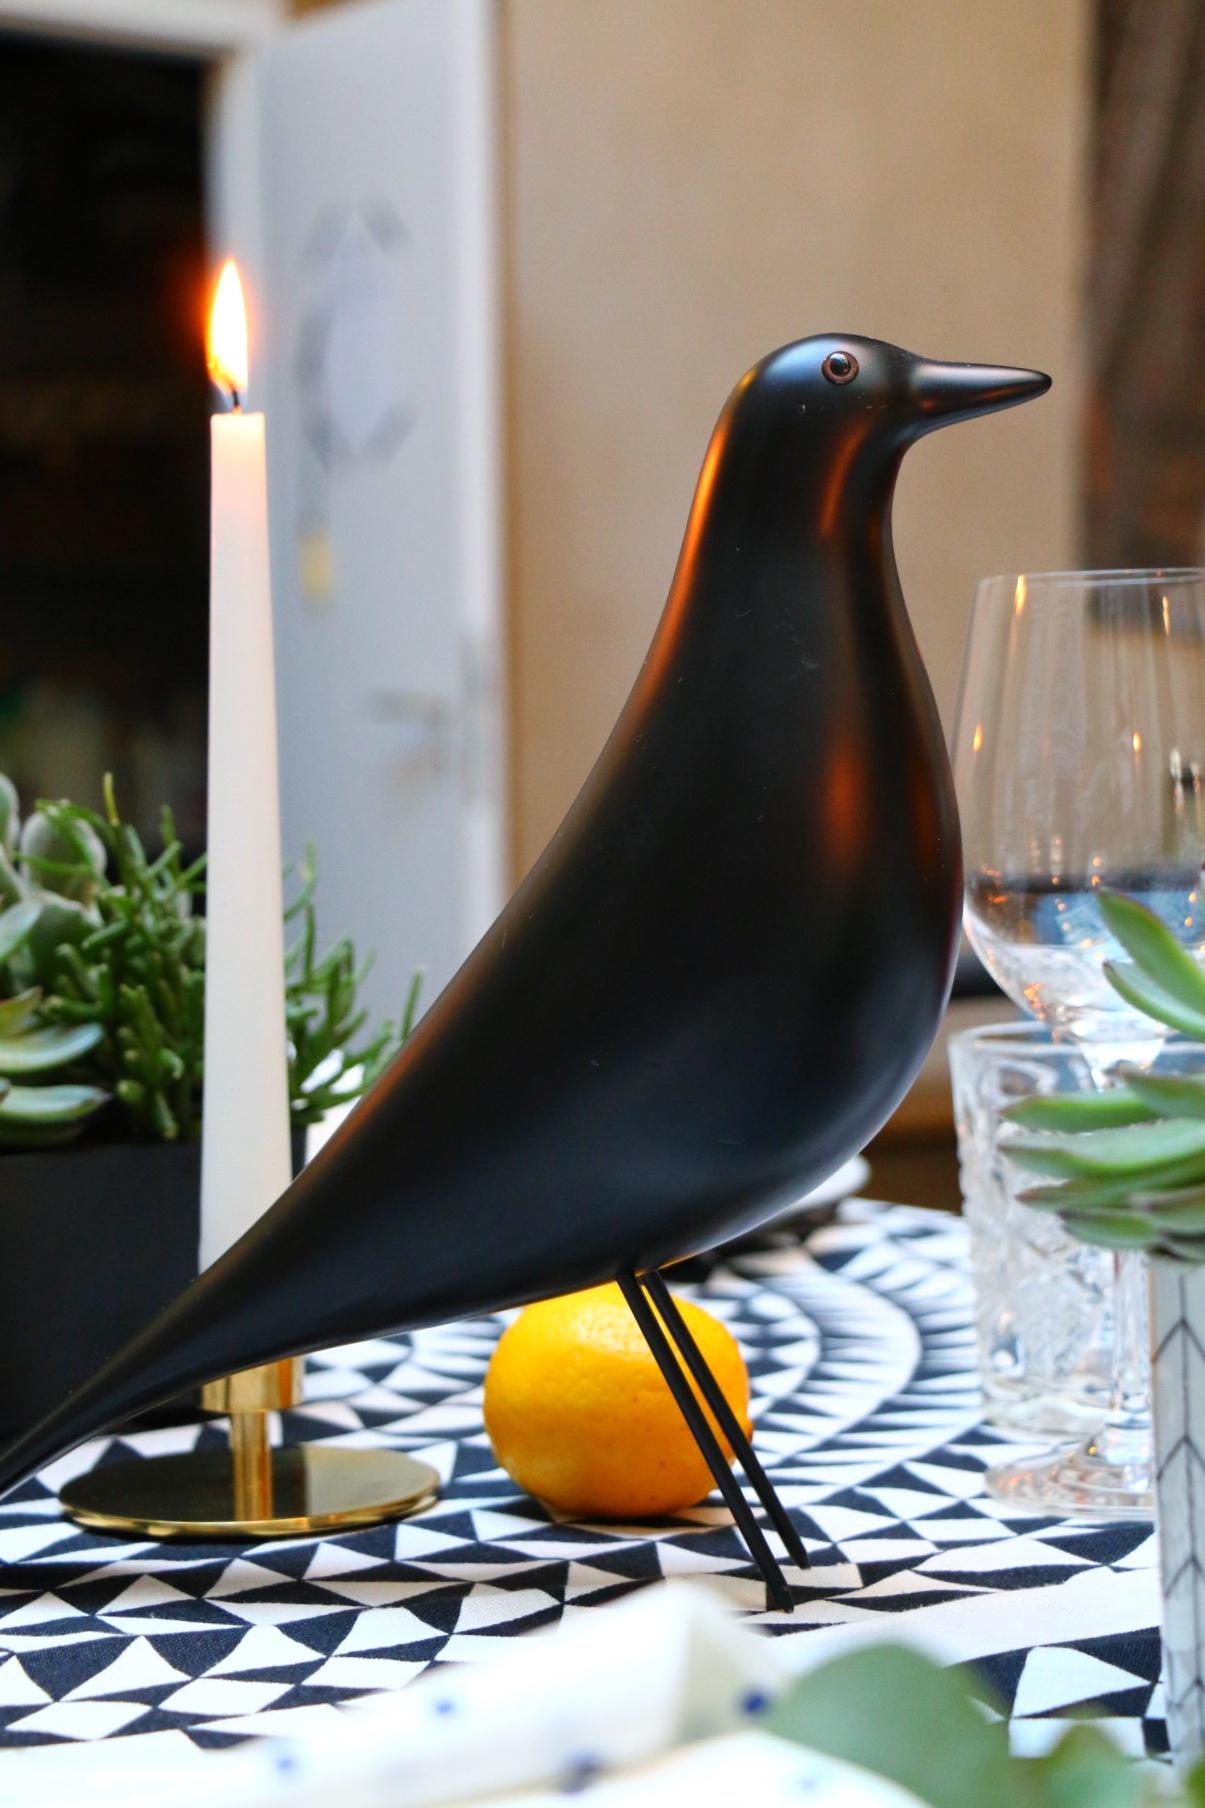 Eames House Bird - Vitra Summer Dinner in Berlin by eat blog love